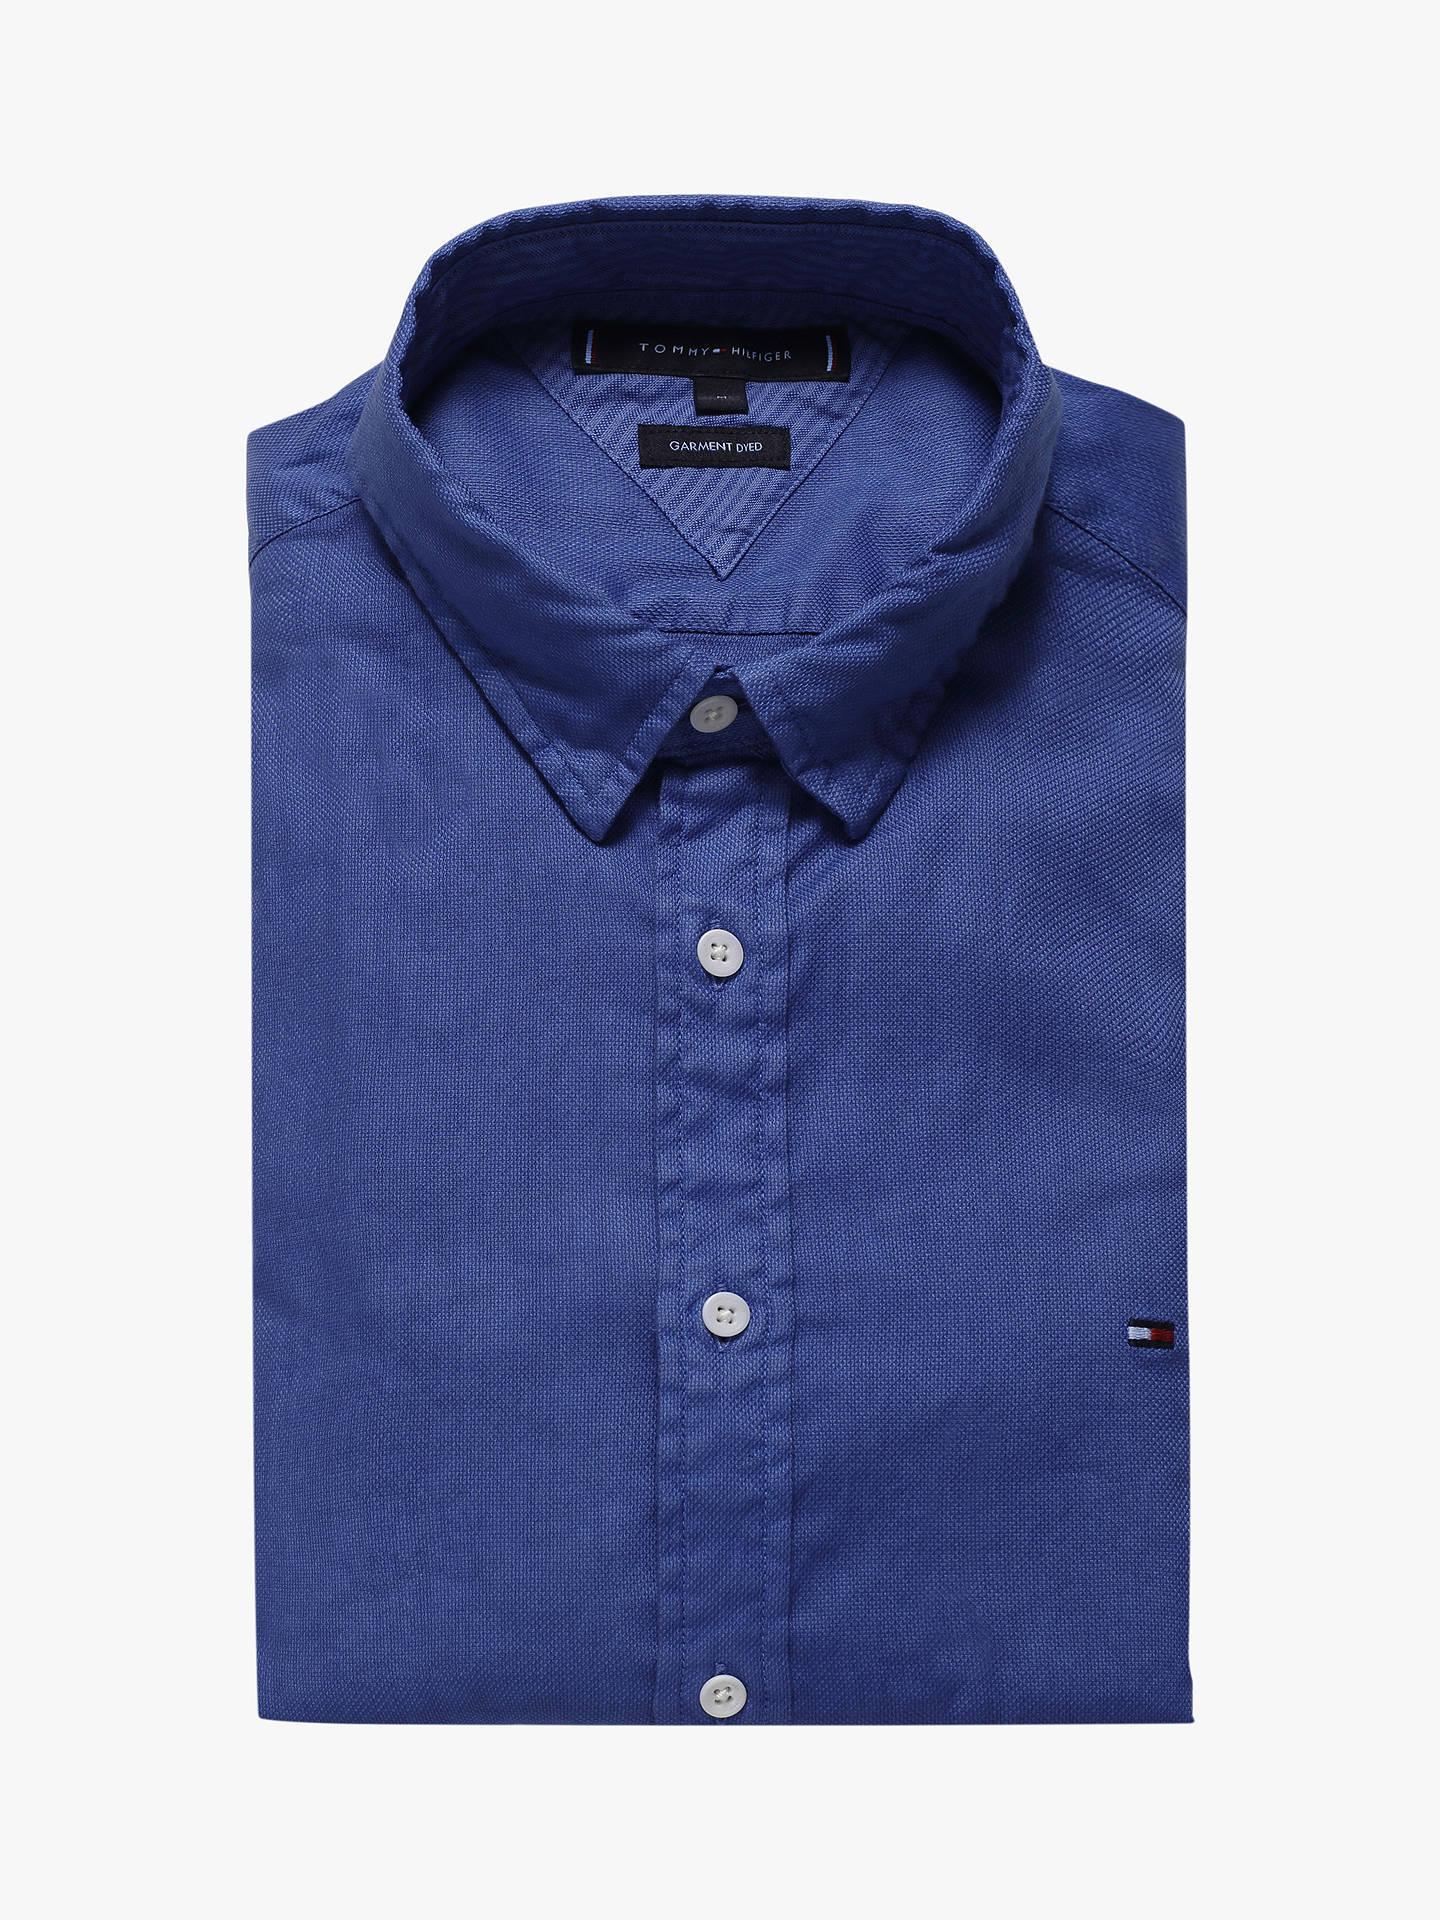 Tommy Hilfiger Cotton Linen Dobby Shirt blue quartz Tommy